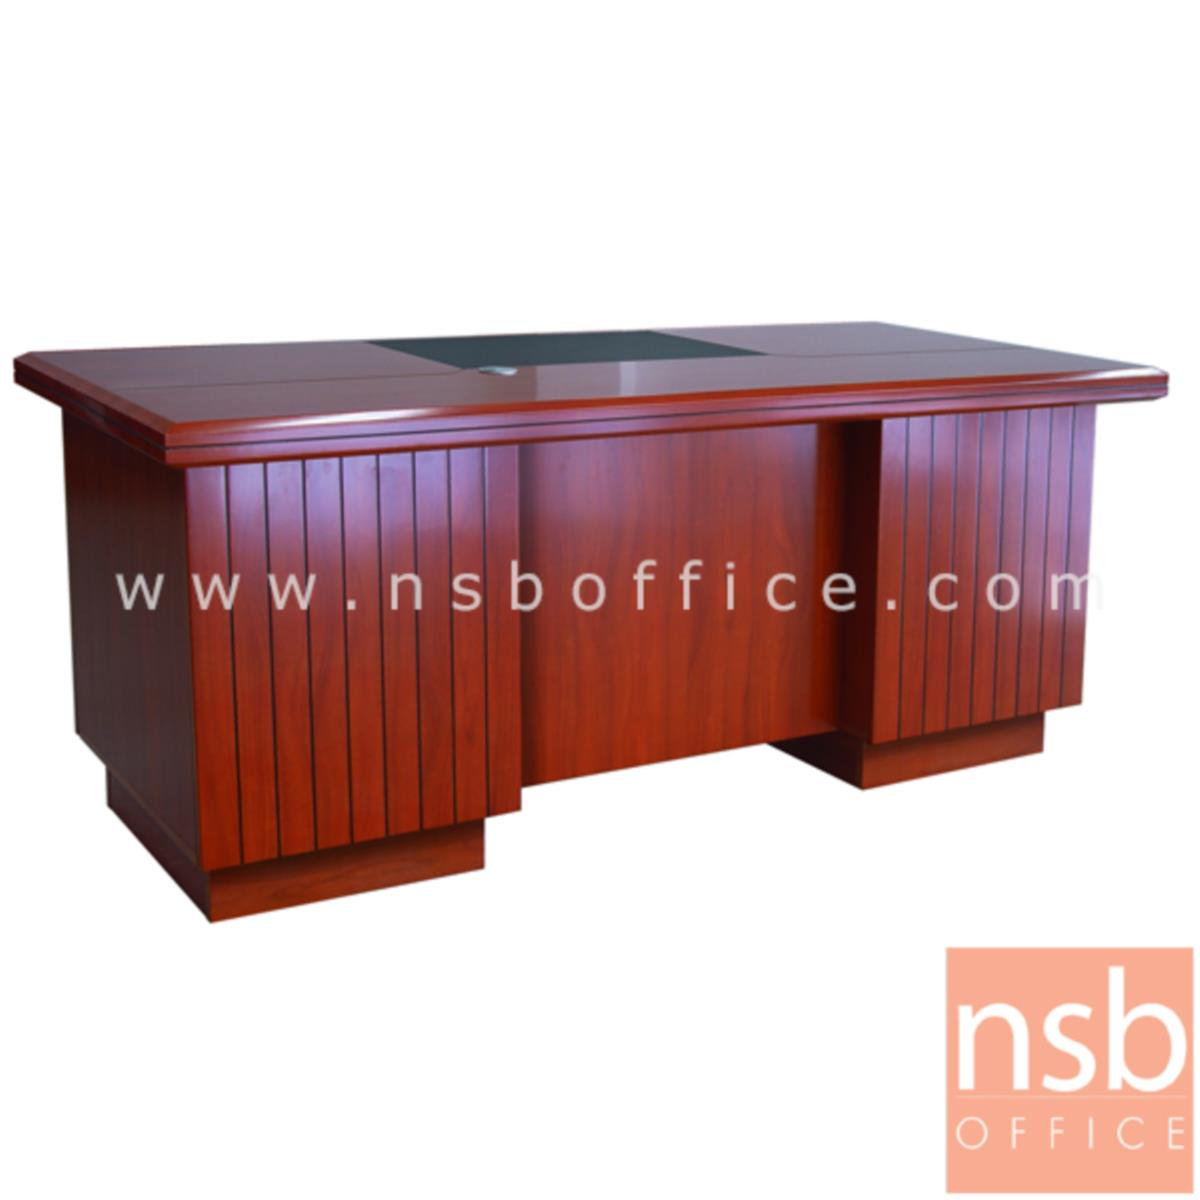 A06A121:โต๊ะผู้บริหารทรงตรง 3 ลิ้นชัก รุ่น Byron (ไบรอน) ขนาด 180W cm. พร้อมรางคีย์บอร์ด